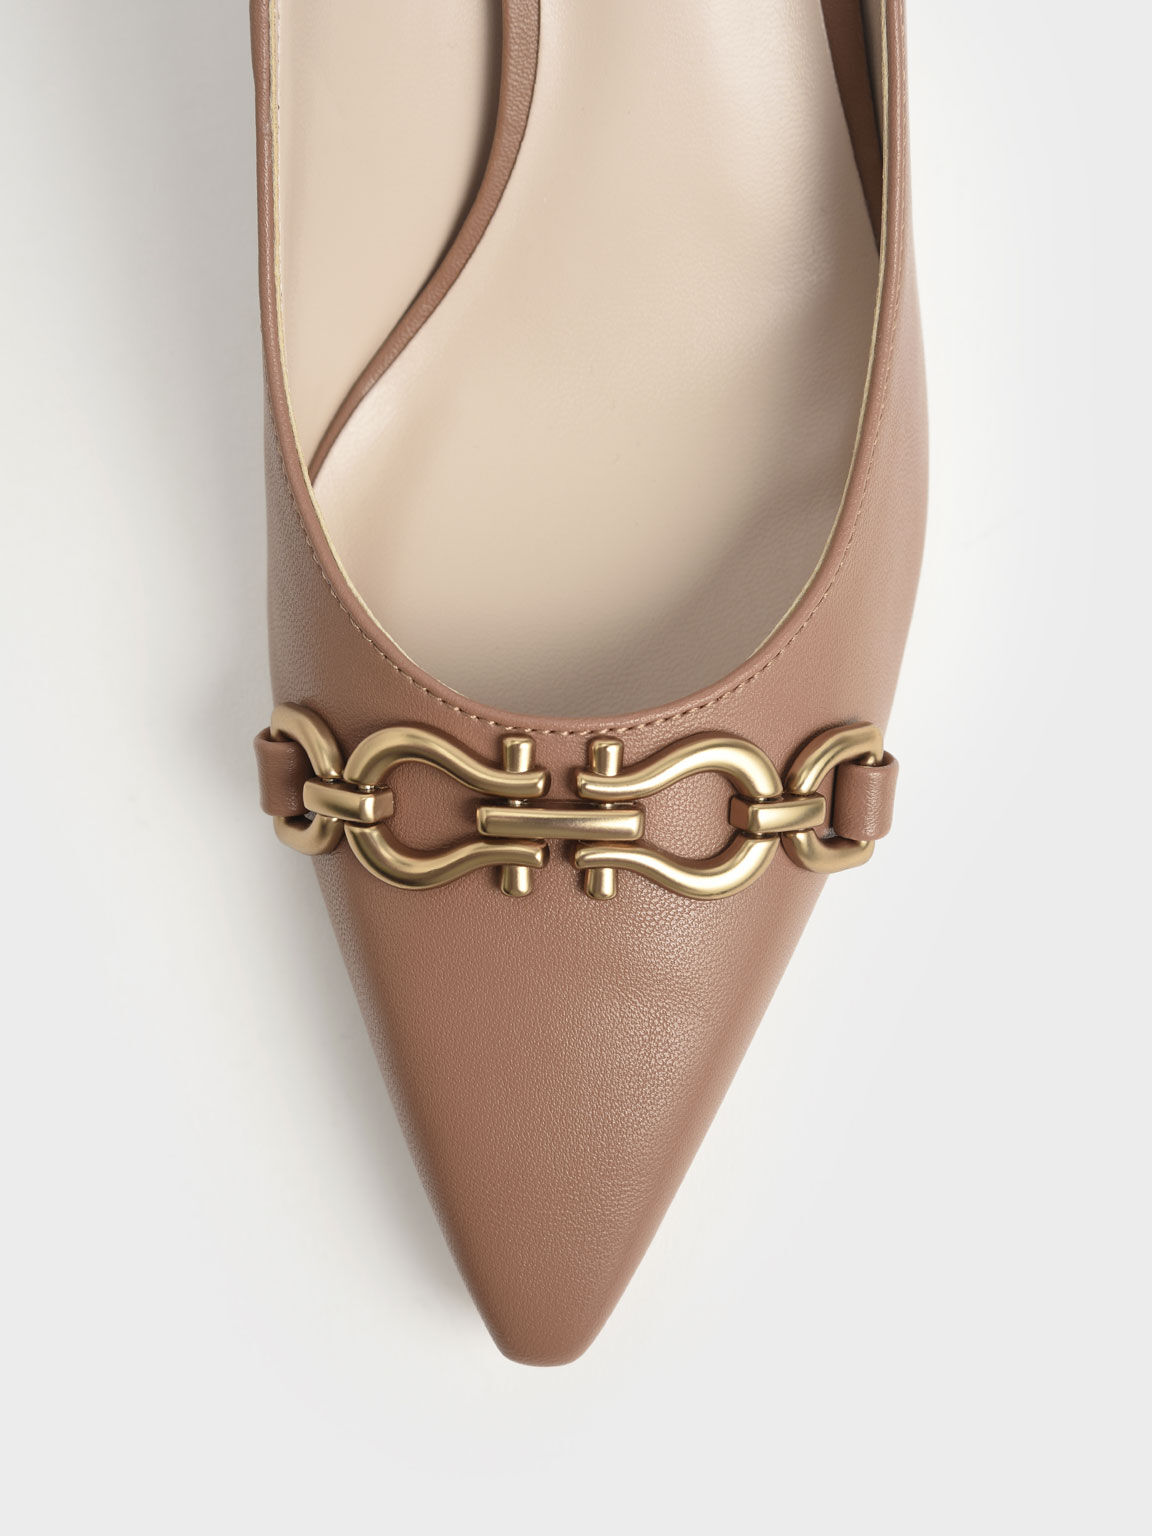 Sepatu Chain Link Pointed Toe Pumps, Camel, hi-res